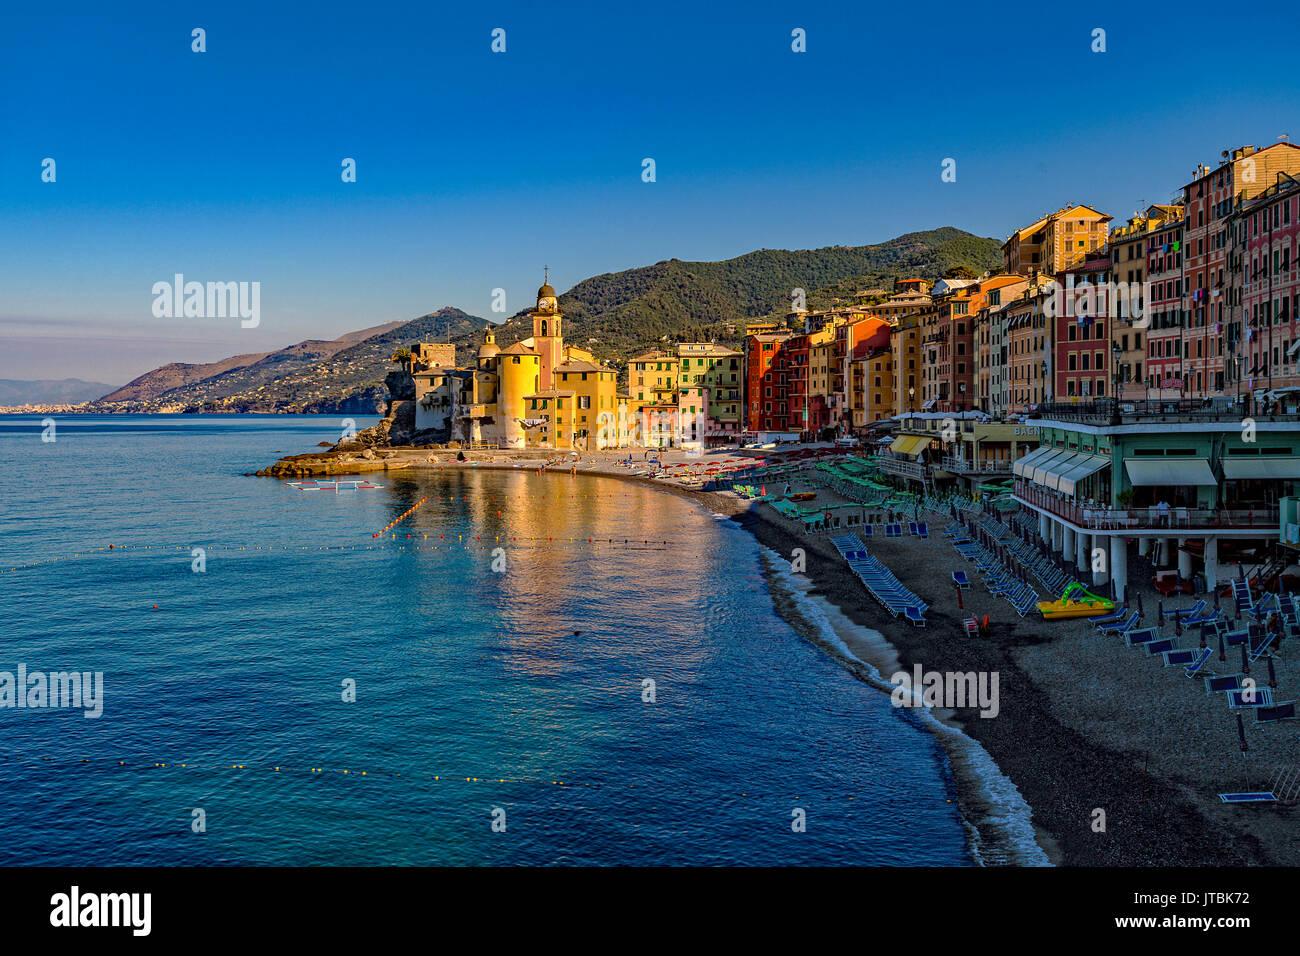 Italy Liguria Camogli - View with beach and church Santa Maria Assunta - Stock Image